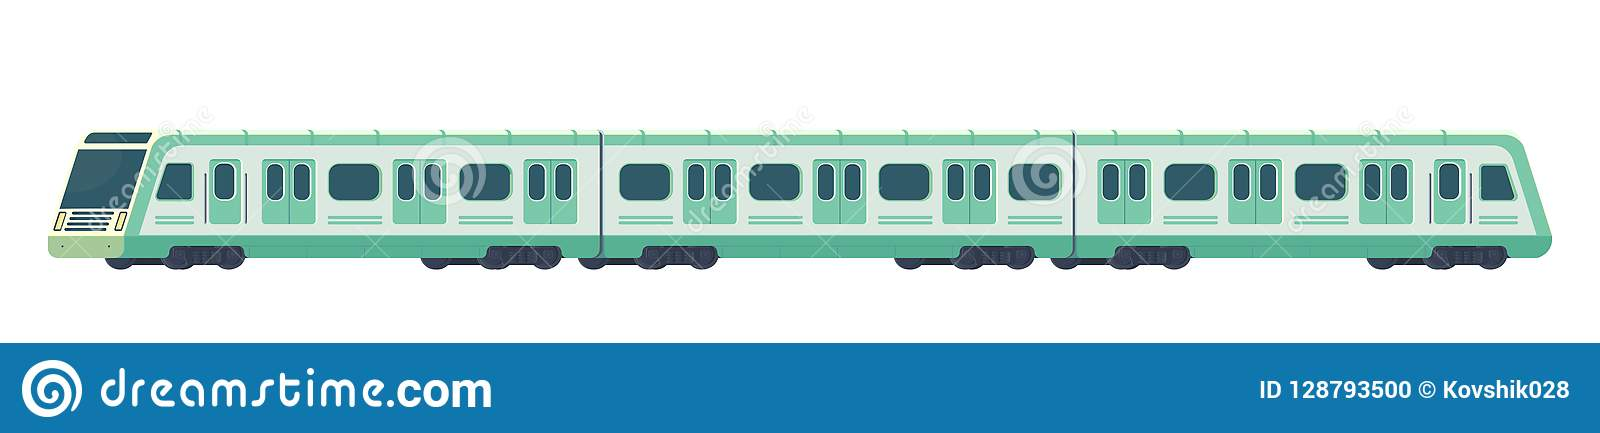 Passanger modern electric high-speed train. Railway subway or metro transport. Underground train Vector illustration